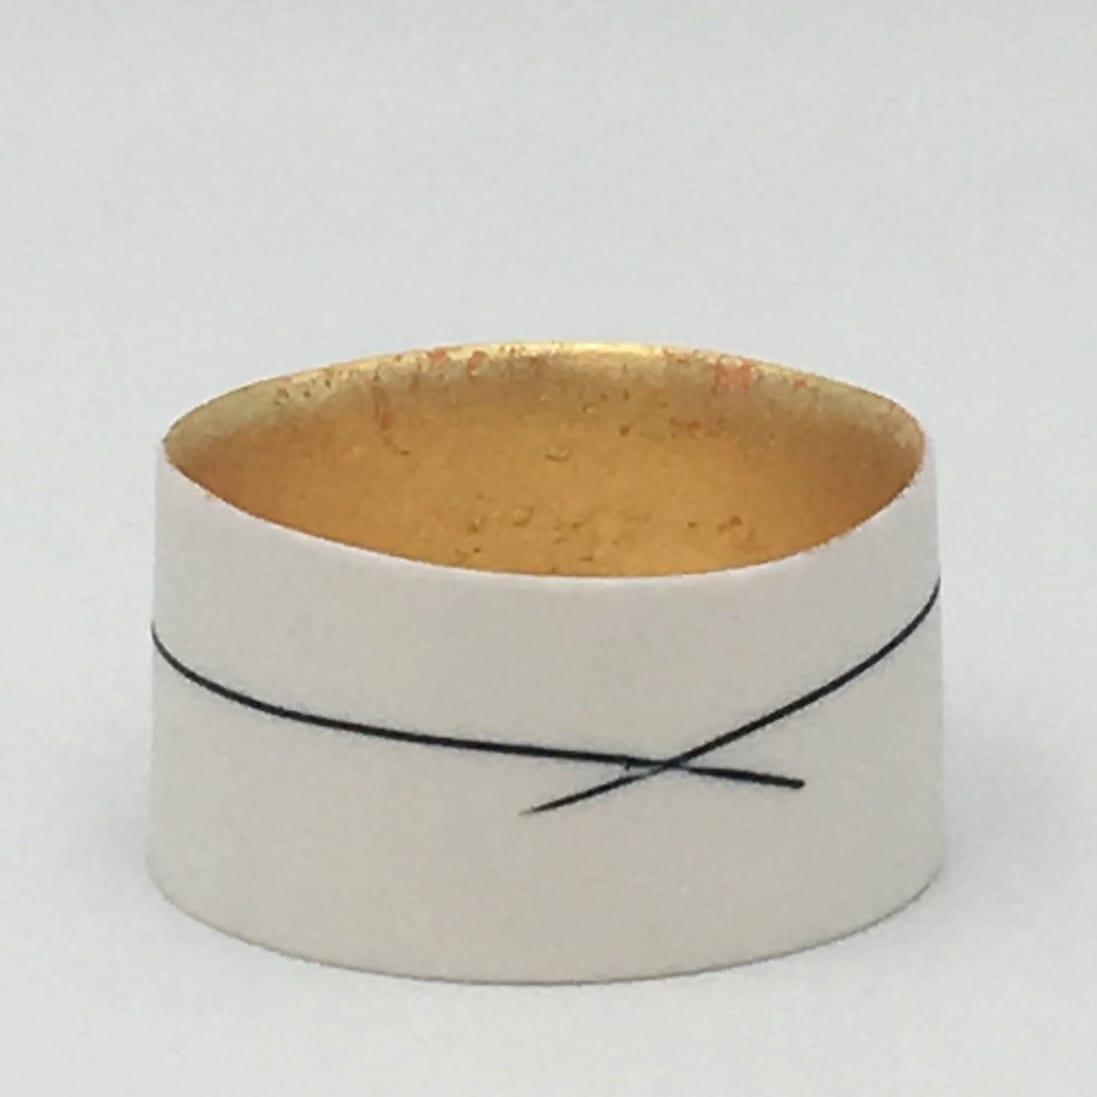 "<span class=""link fancybox-details-link""><a href=""/artists/195-lara-scobie/works/6519-lara-scobie-small-23ct-gold-bowl-2019/"">View Detail Page</a></span><div class=""artist""><strong>Lara Scobie</strong></div> b. 1967 <div class=""title""><em>Small 23ct Gold Bowl</em>, 2019</div> <div class=""medium"">Porcelain</div>"